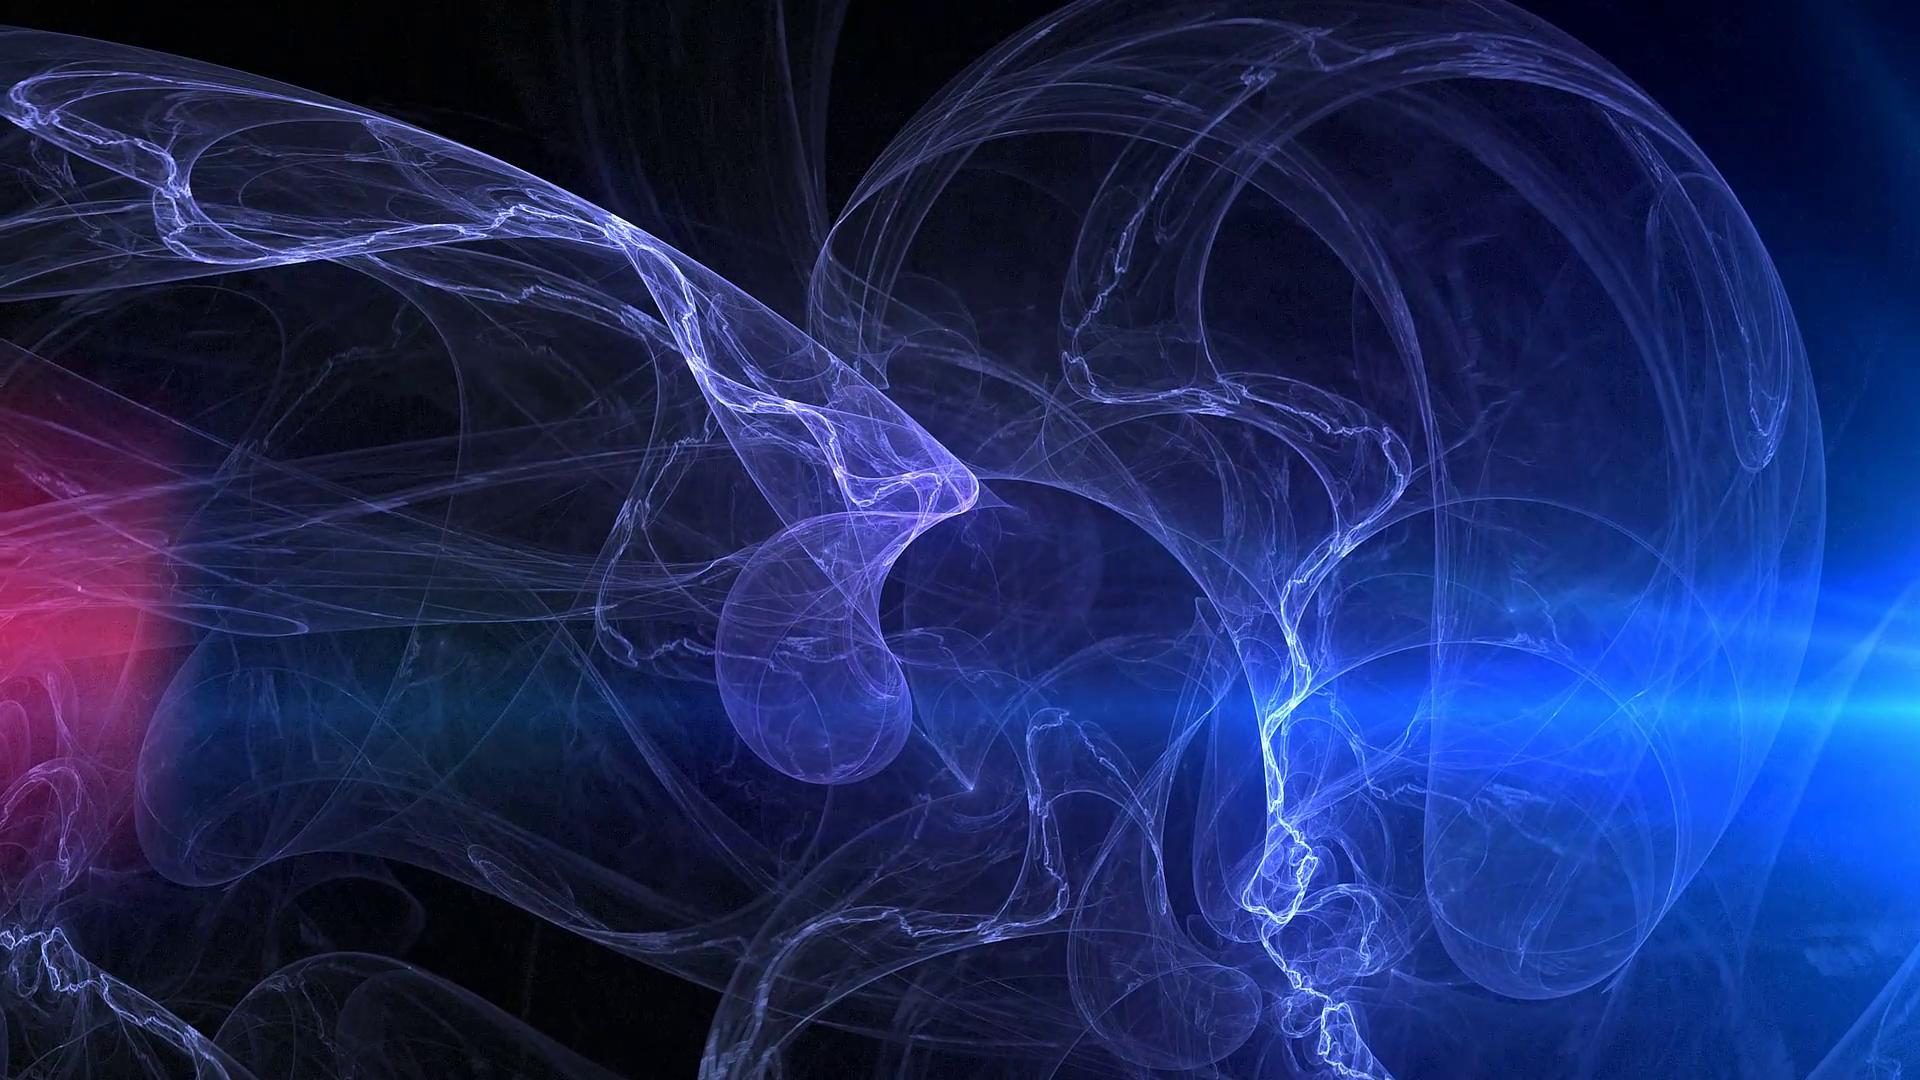 Abstract Plasma with Light streak Motion Background - Videoblocks